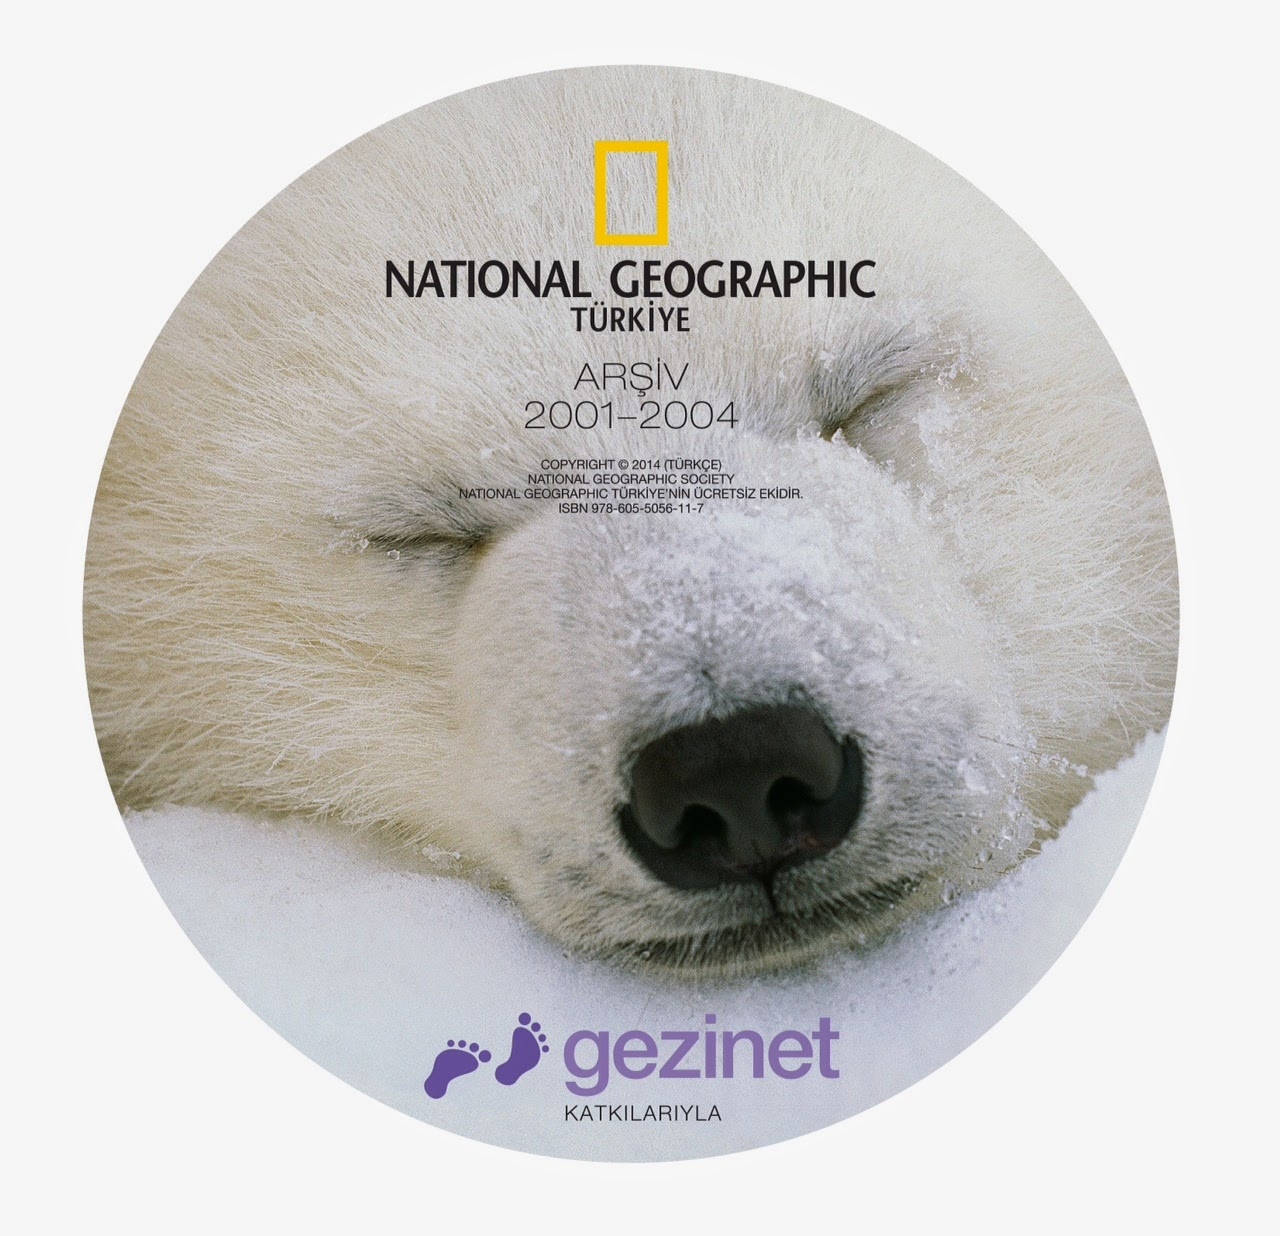 national geographic türkiye arşivi